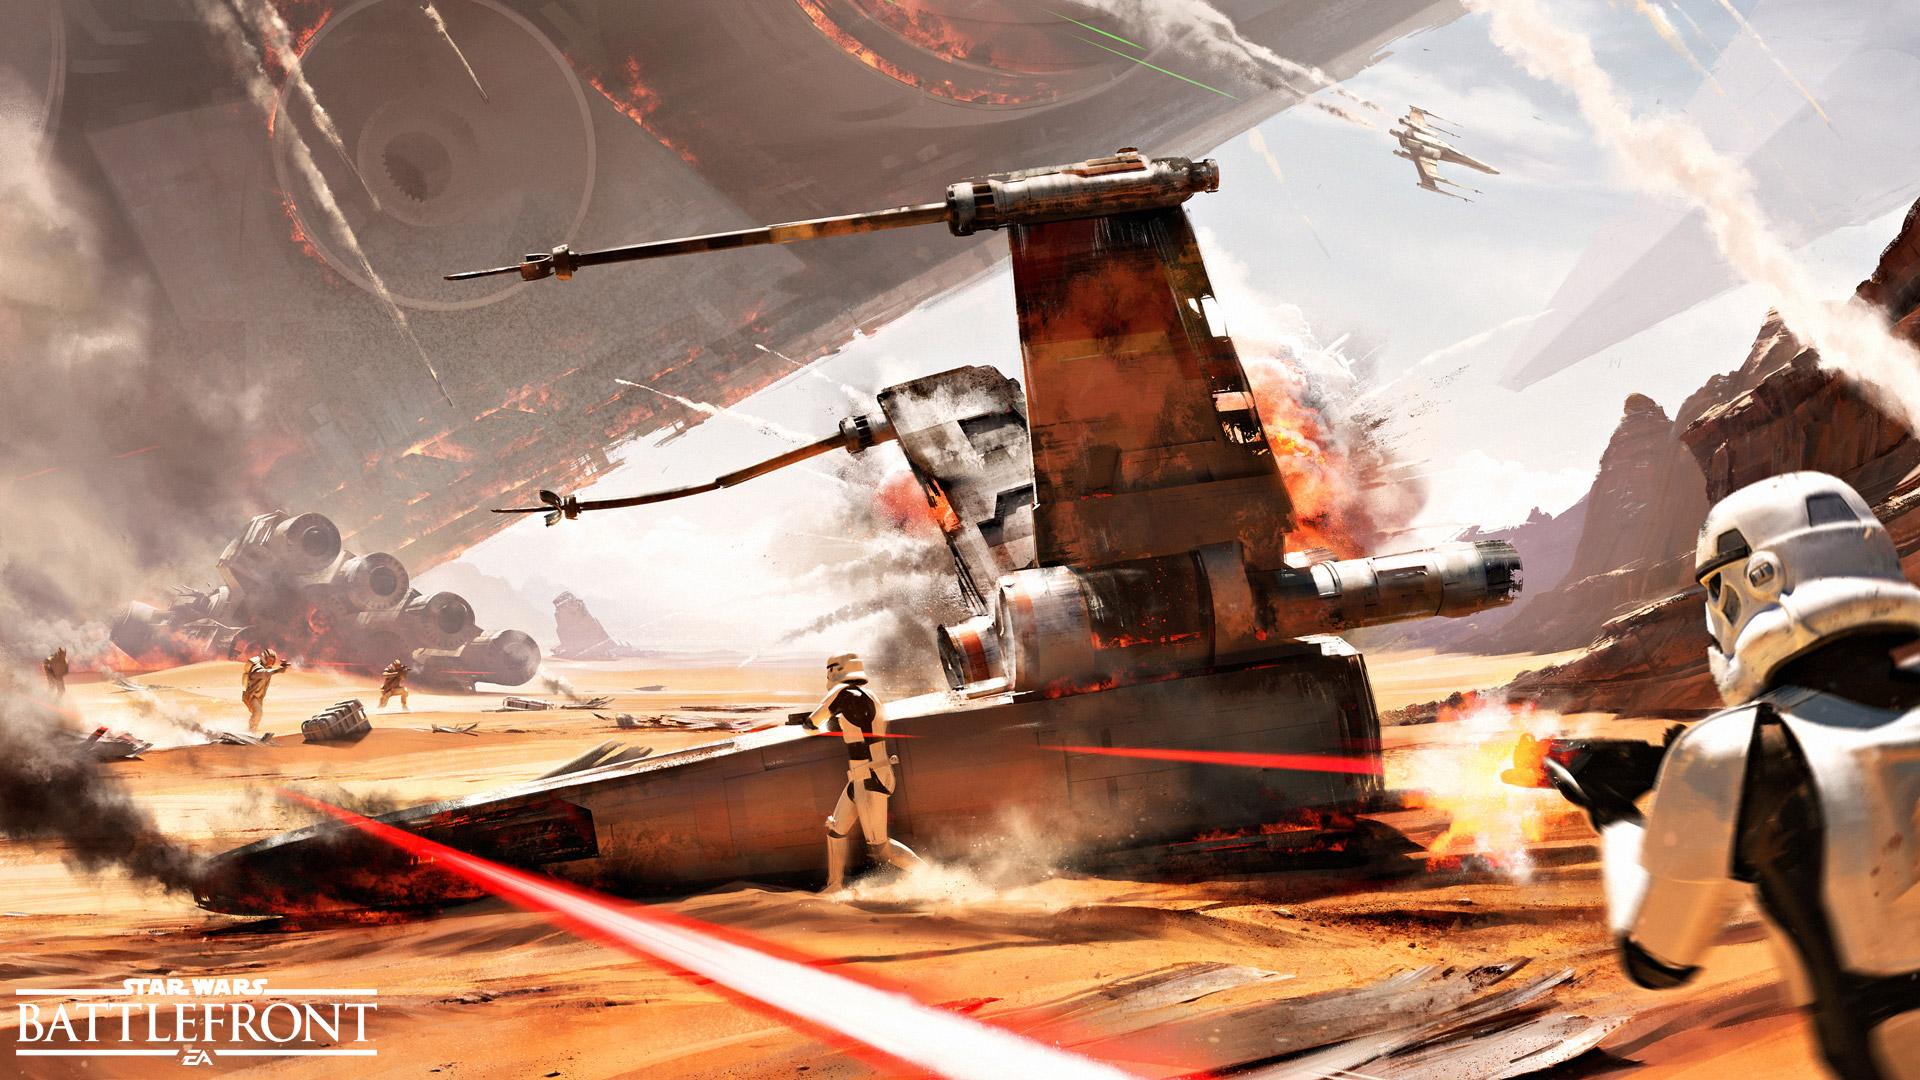 Arte conceptual de La batalla de Jakku